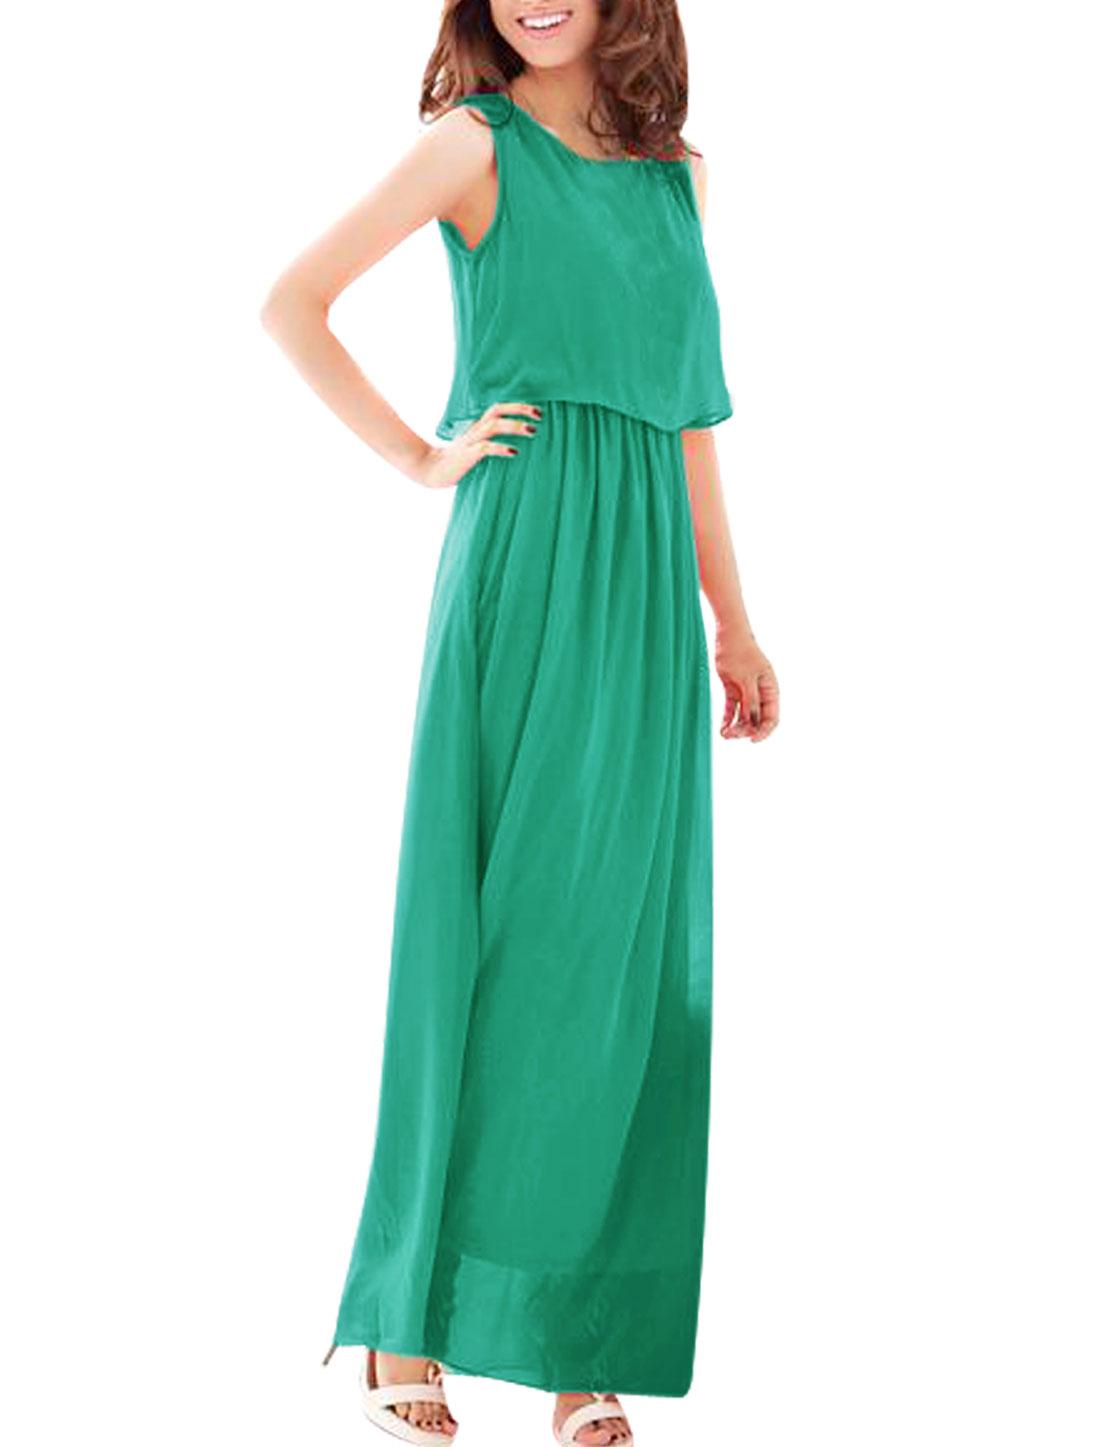 Ladies Chic Scoop Neck Sleeveless Sea Green Full Length Dress XS